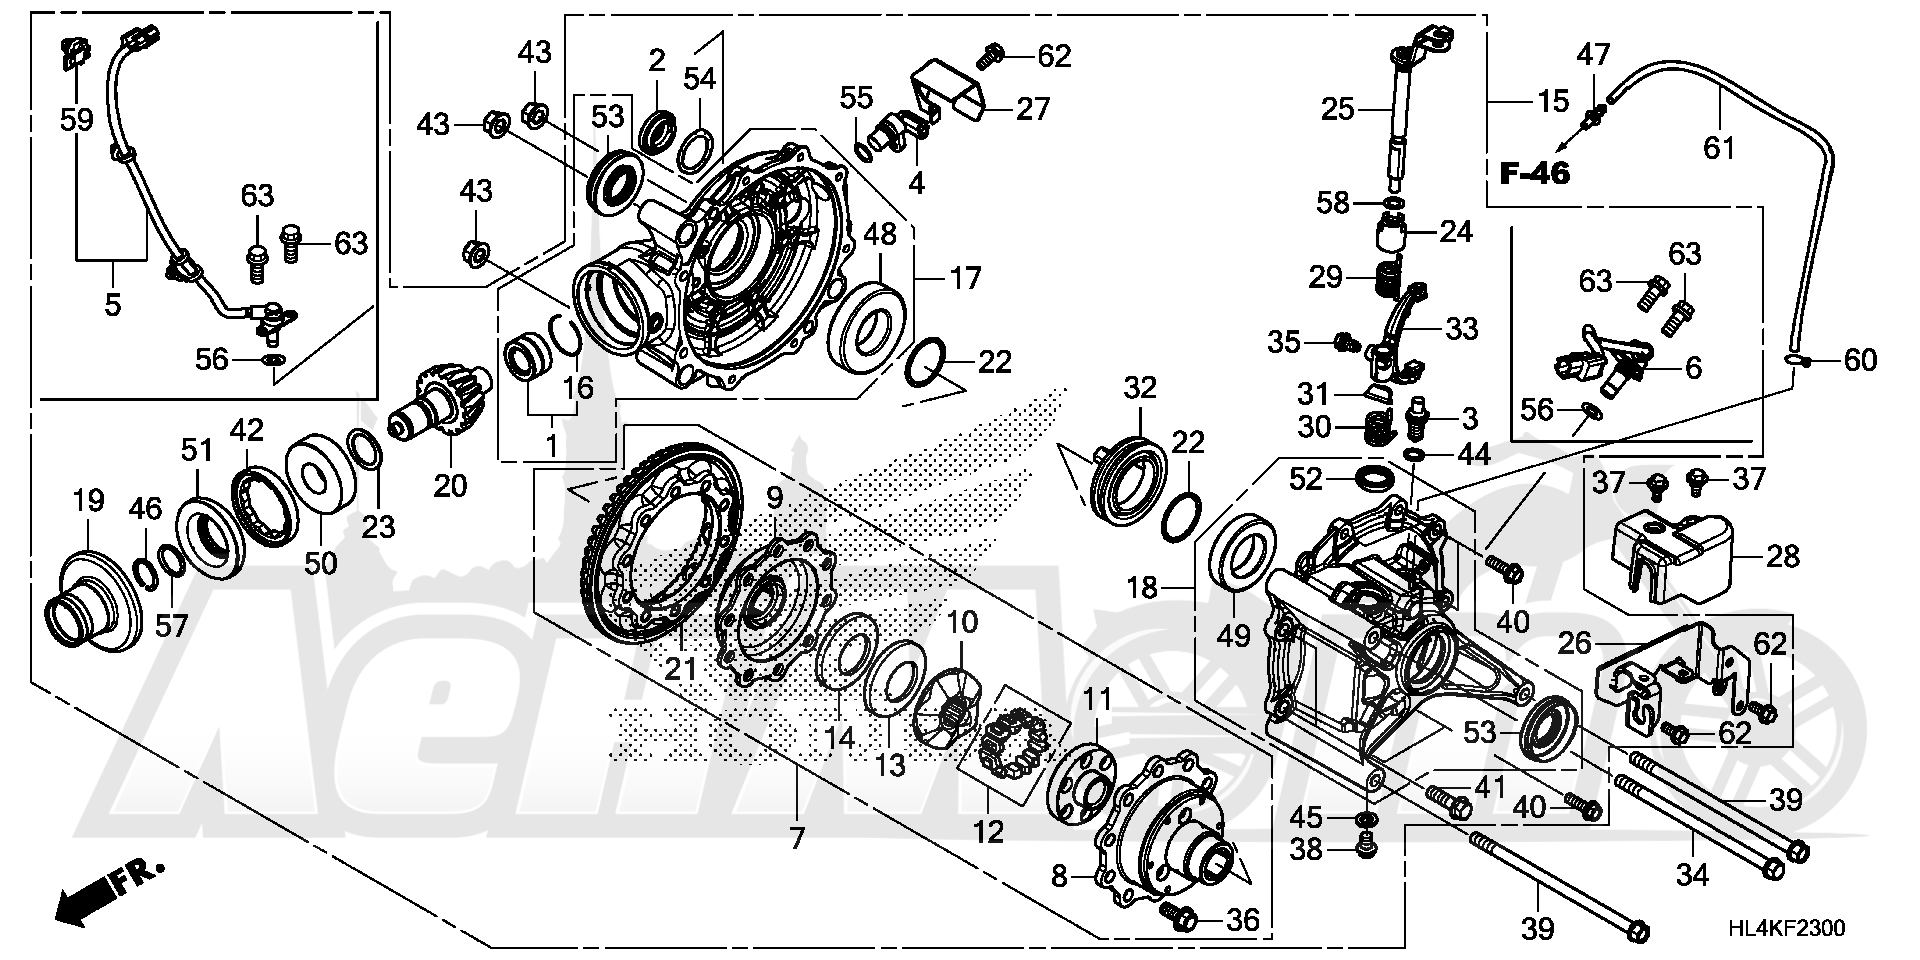 Запчасти для Квадроцикла Honda 2019 SXS1000M3P Раздел: FINAL DRIVEN GEAR   FINAL ведомый шестерня